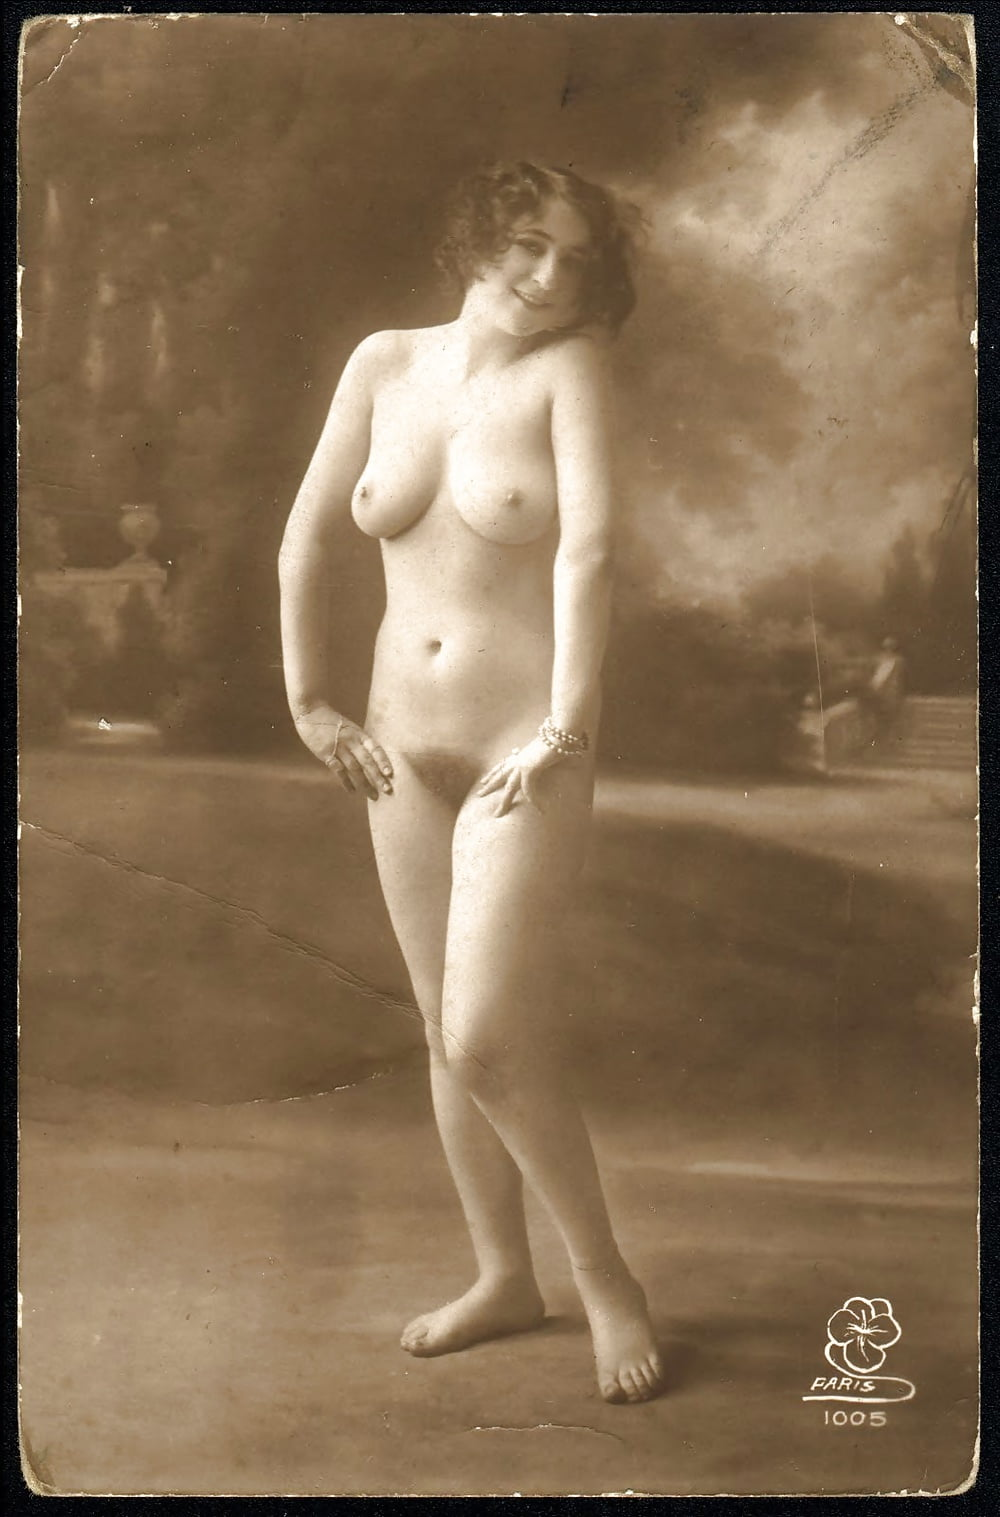 Vintage Retro Porno